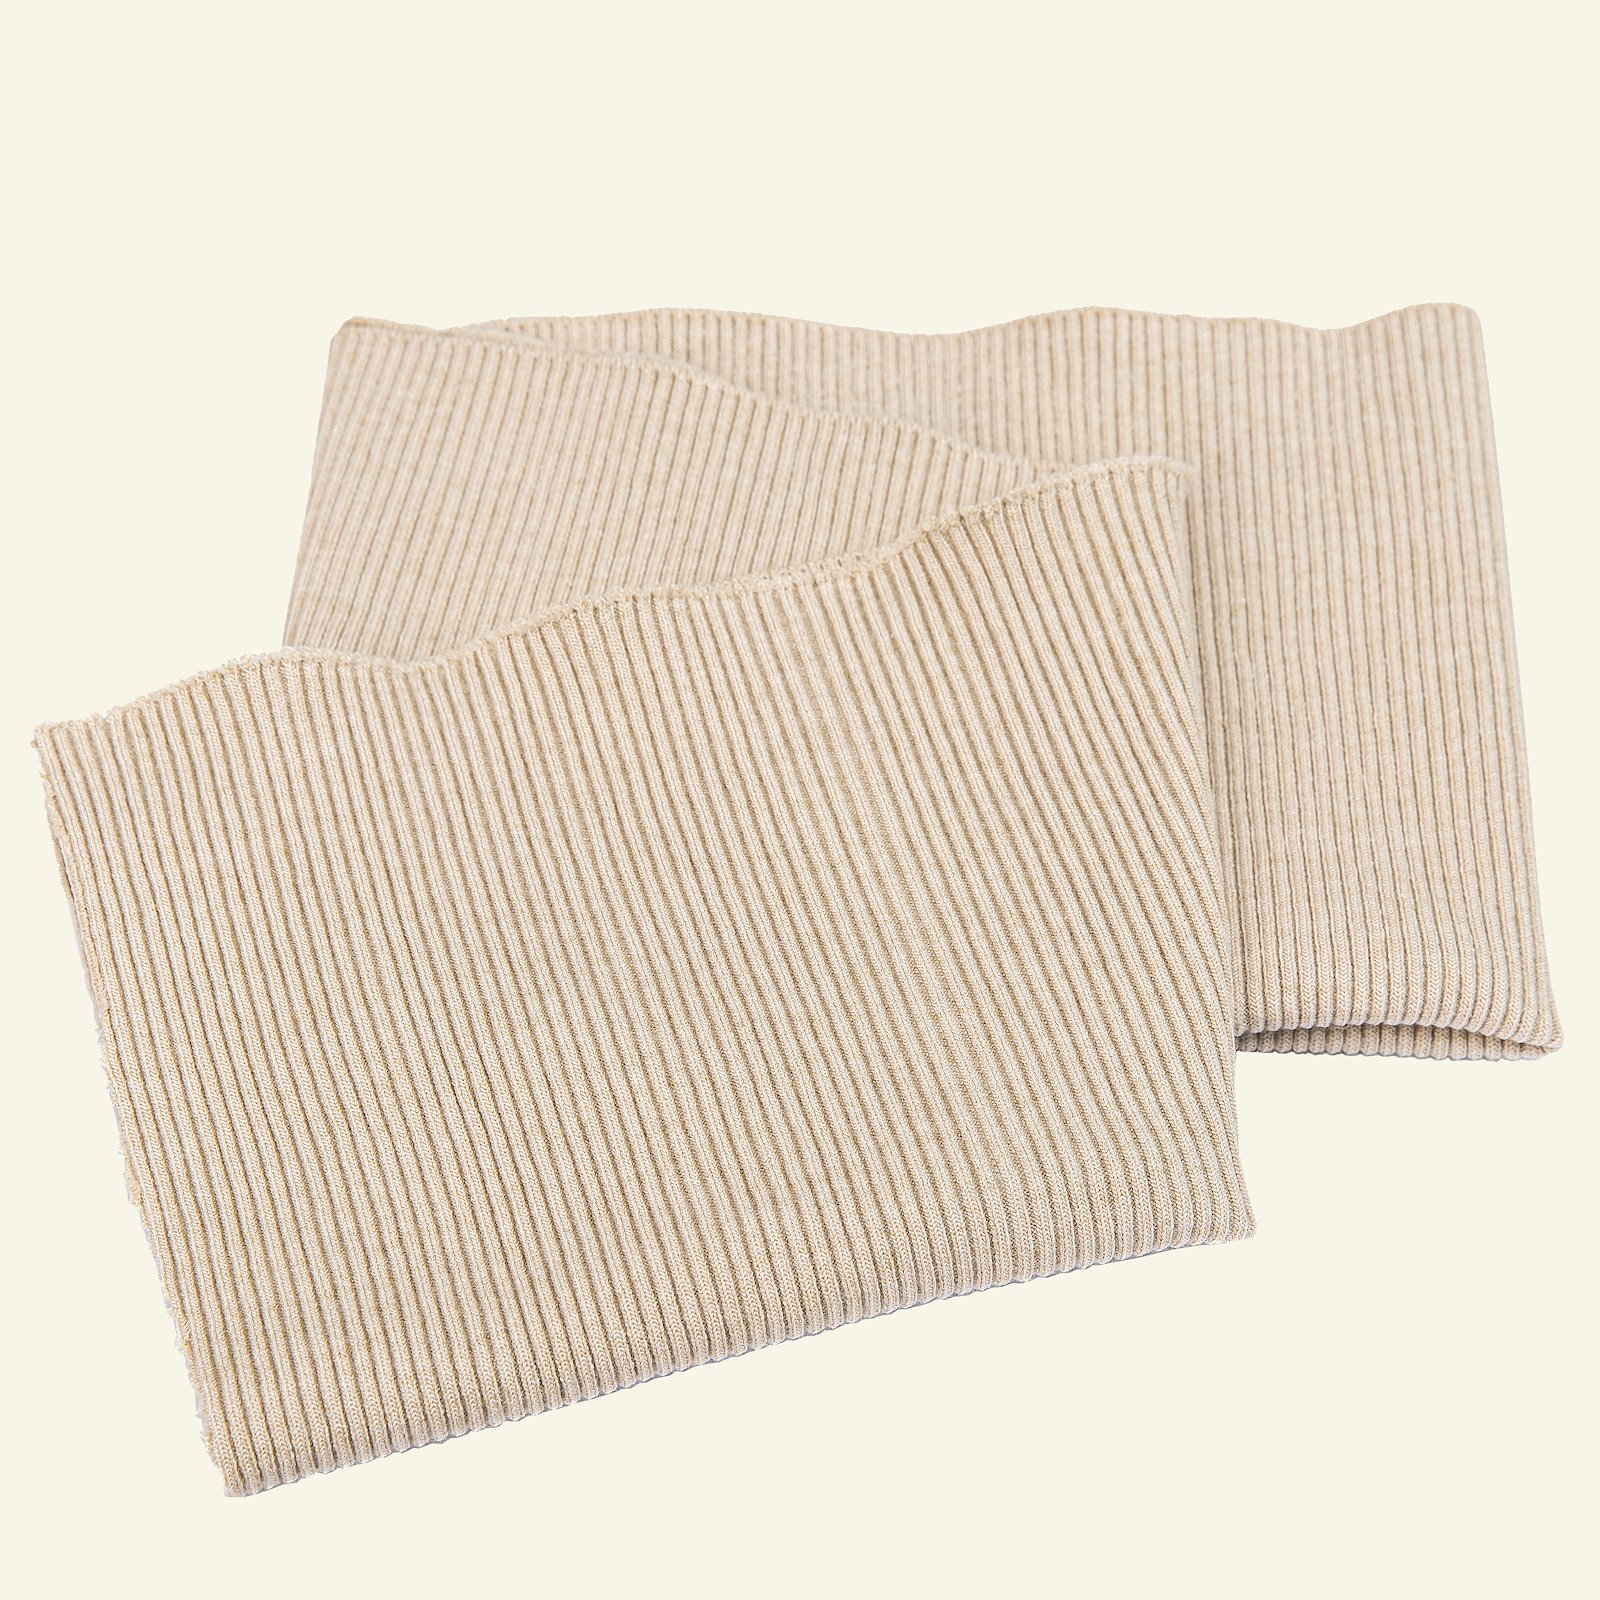 Rib 2x2 30x90cm sand 1pc 96040_pack